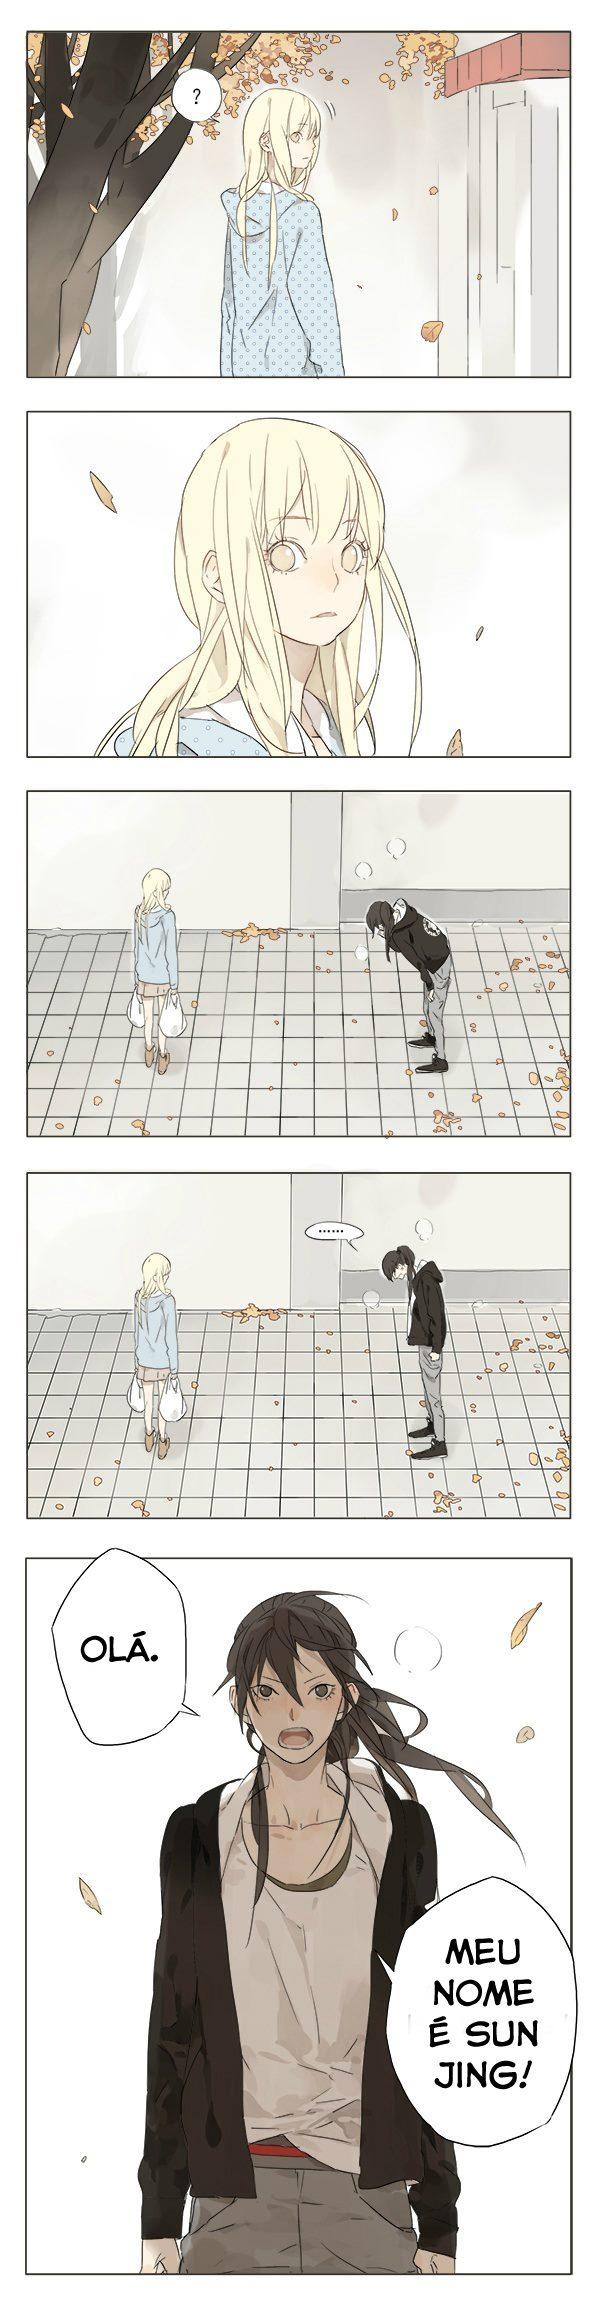 https://nine.mangadogs.com/br_manga/pic/56/1976/1255971/TamennoGushi002338.jpg Page 1